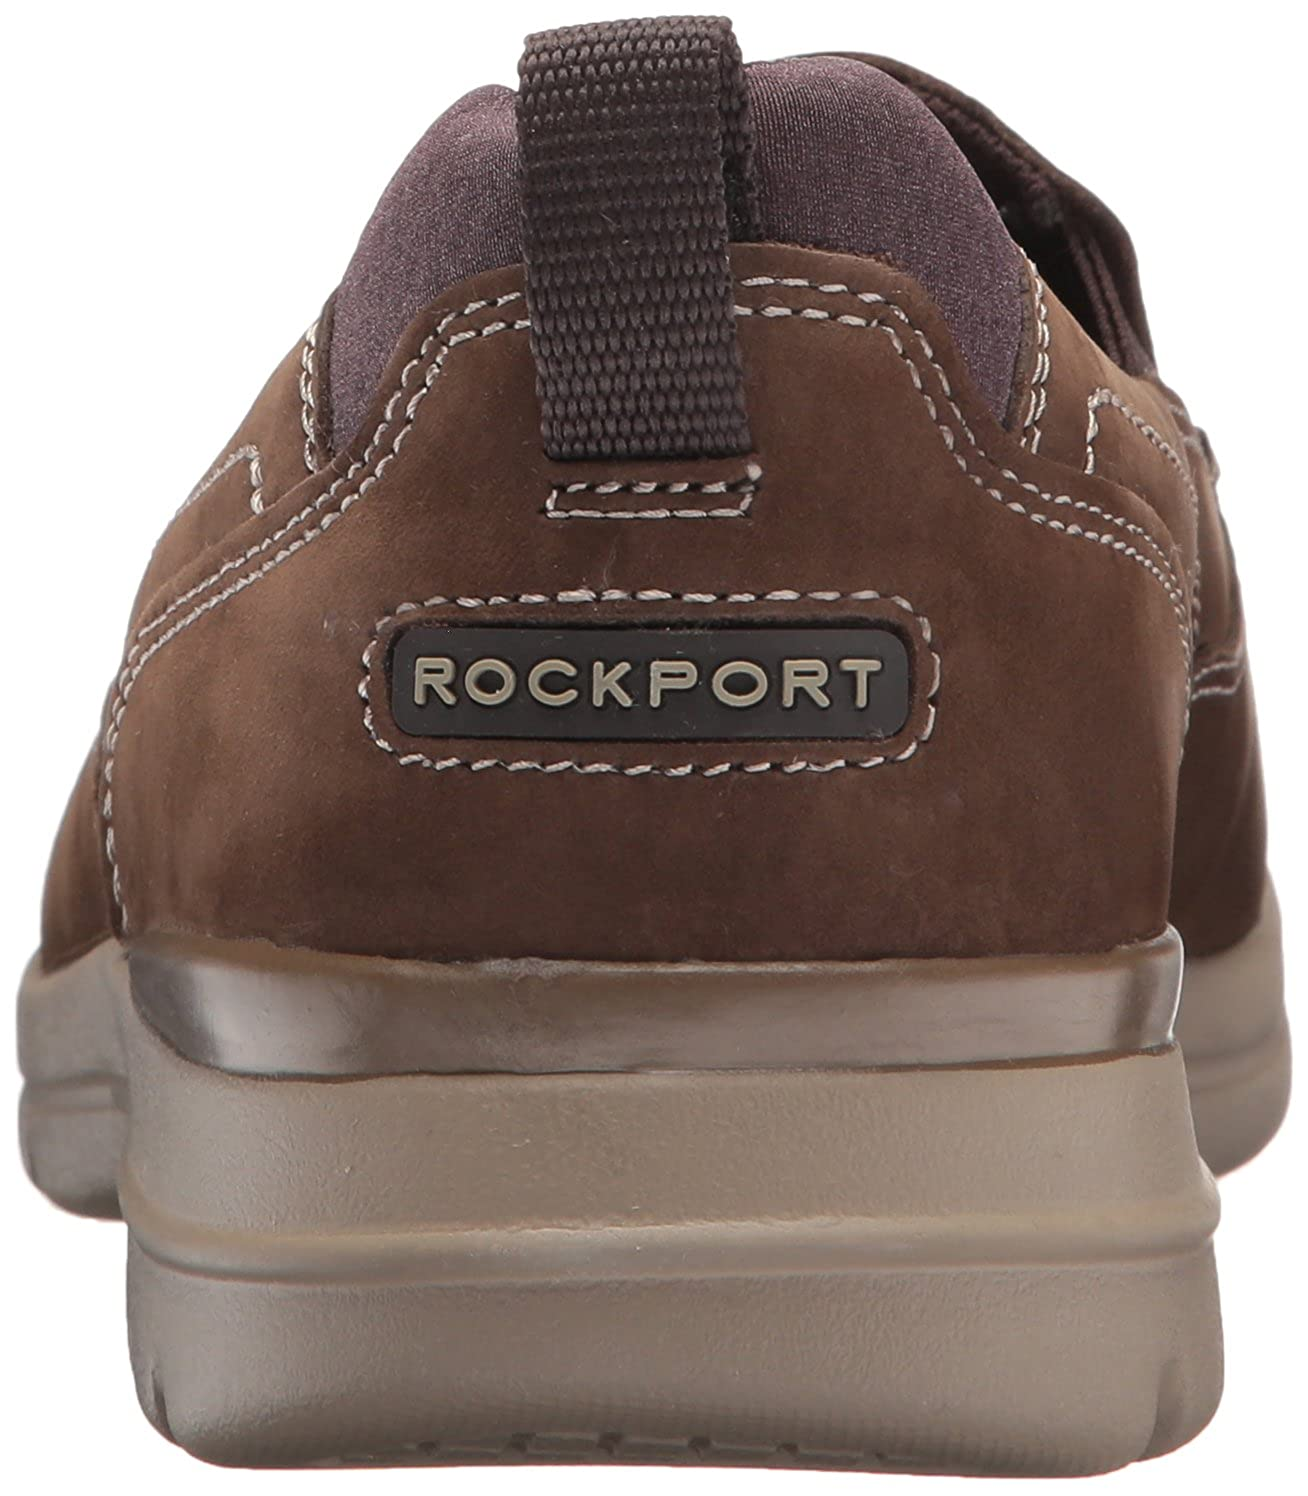 Rockport Mens City Edge Slip on Loafer